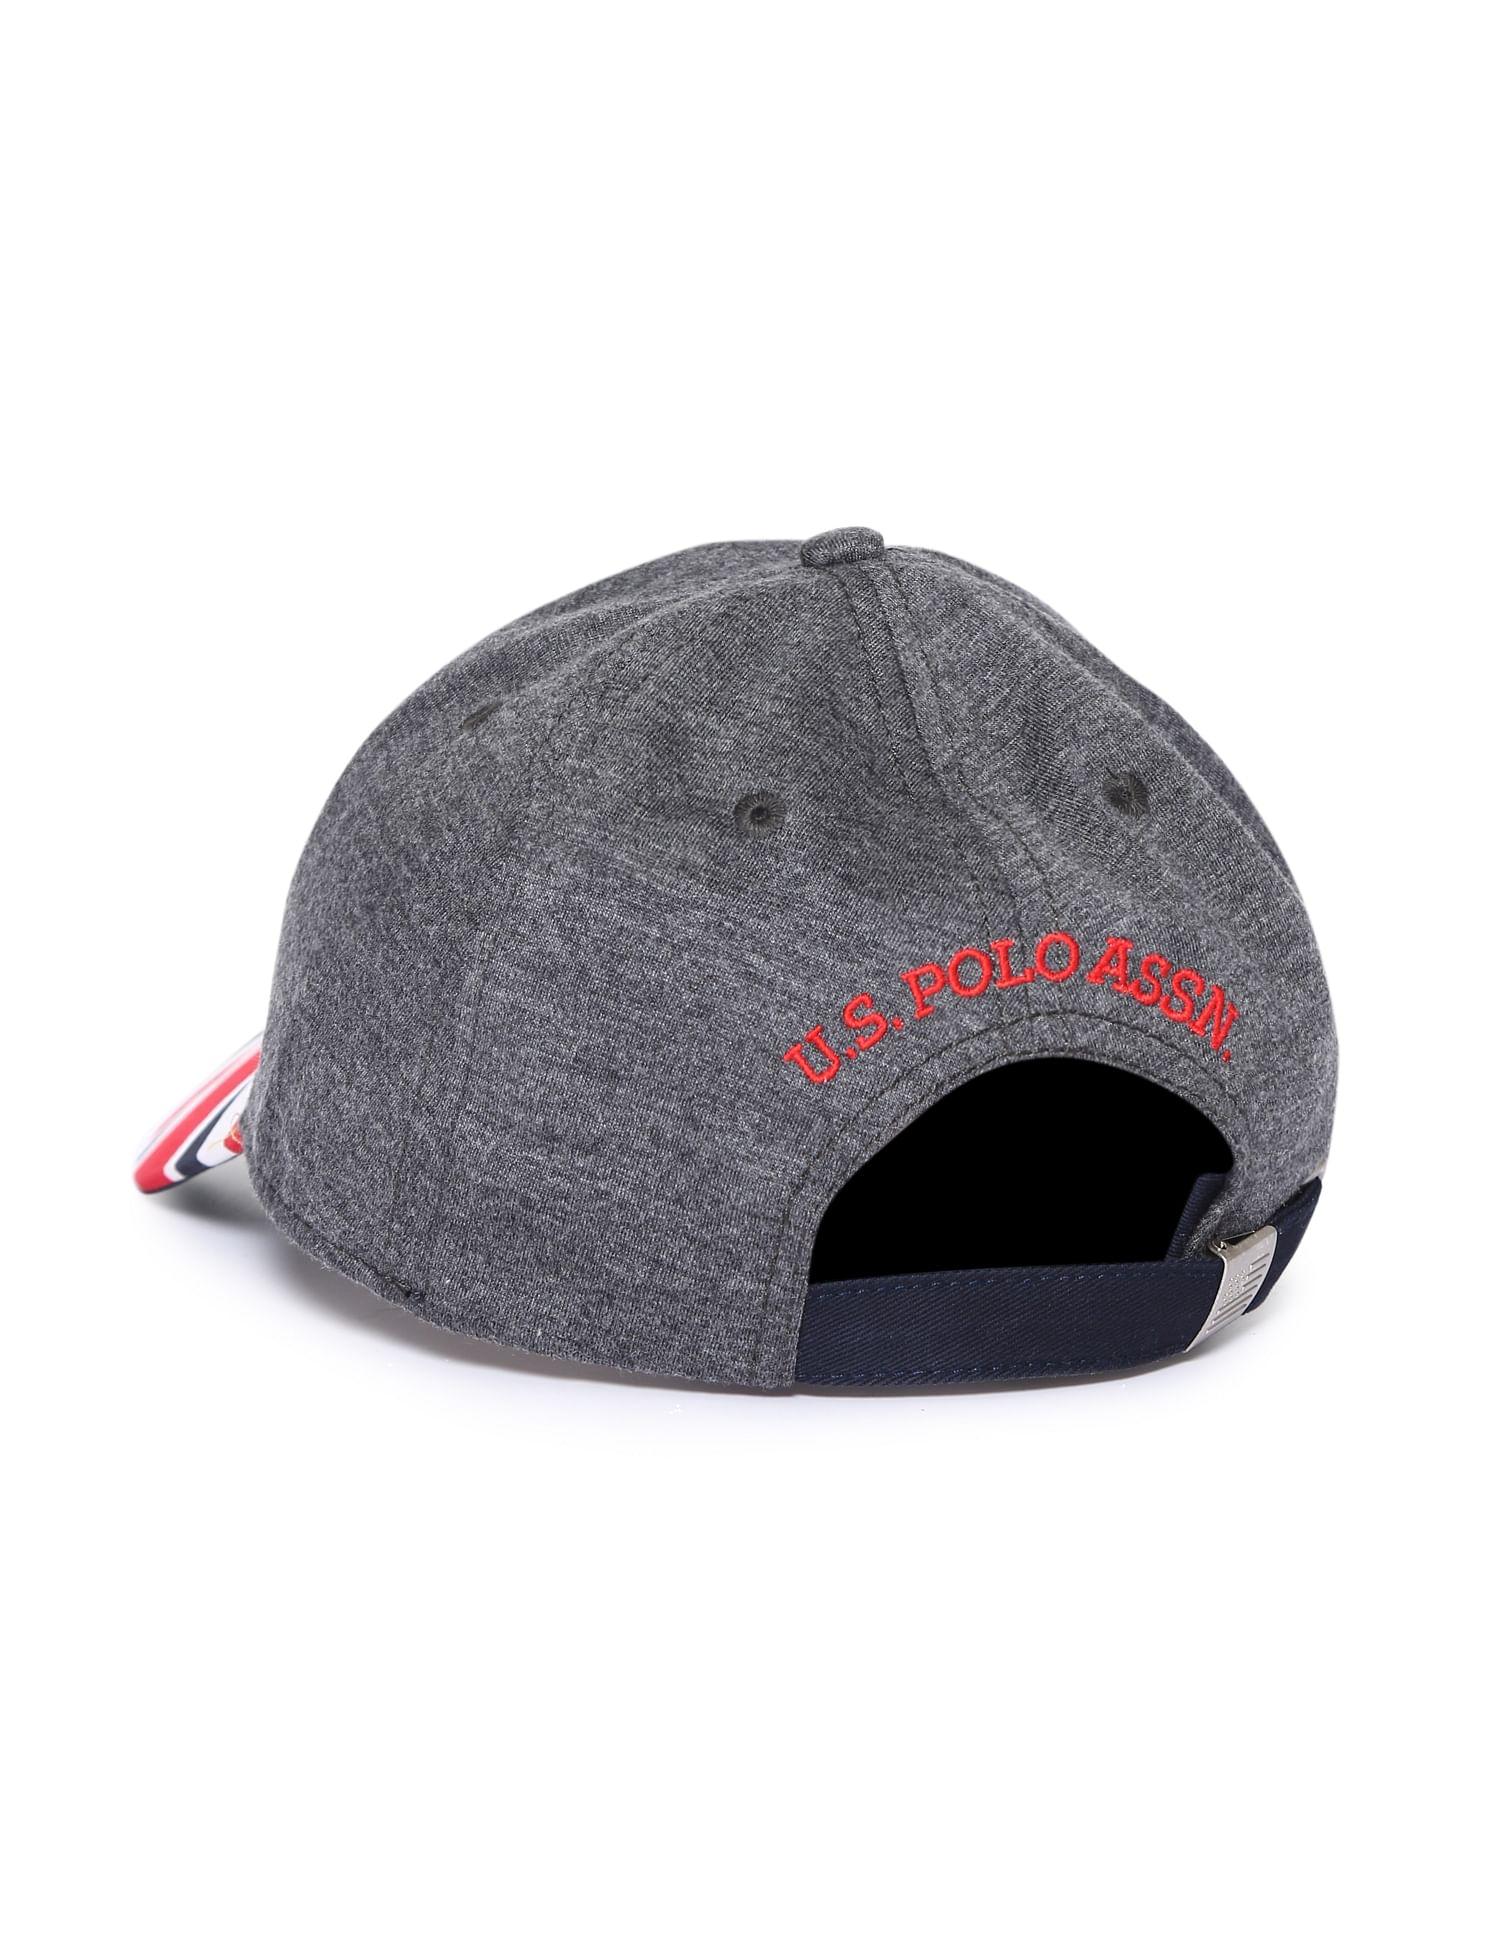 U.S. Polo Assn. Men Casual Wear Solid Cap